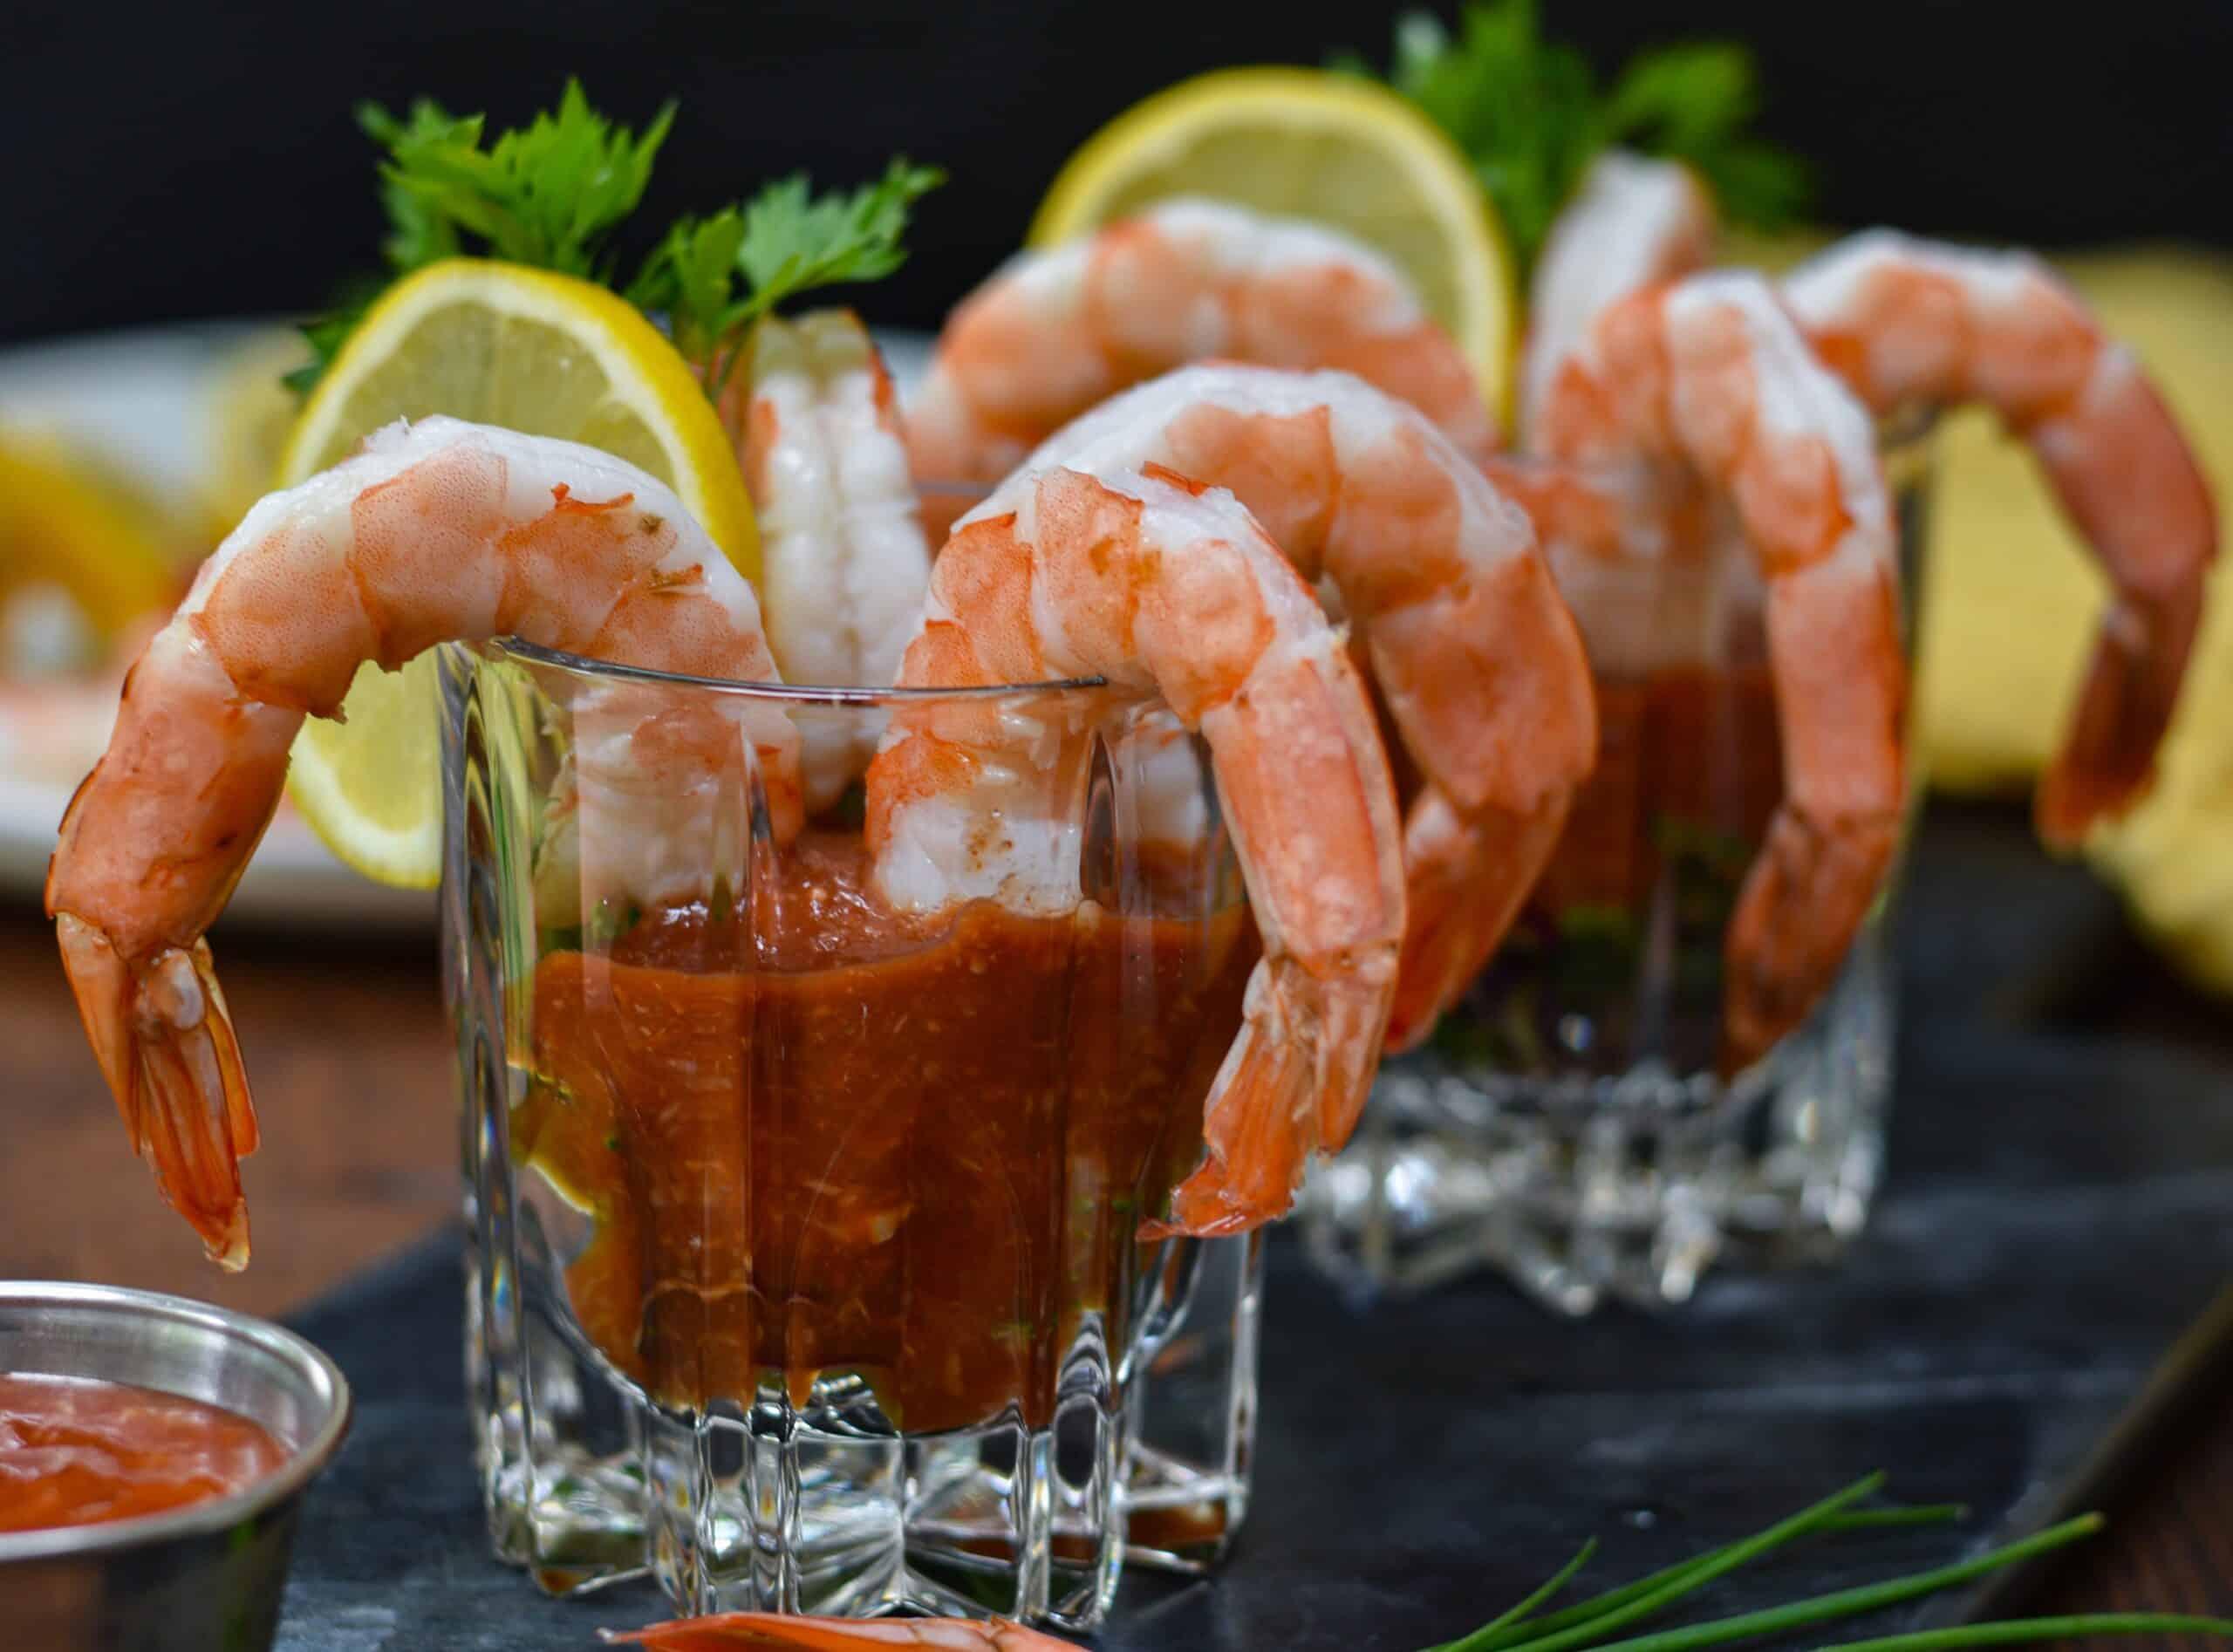 Shrimp Cocktail with Keto Cocktail Sauce